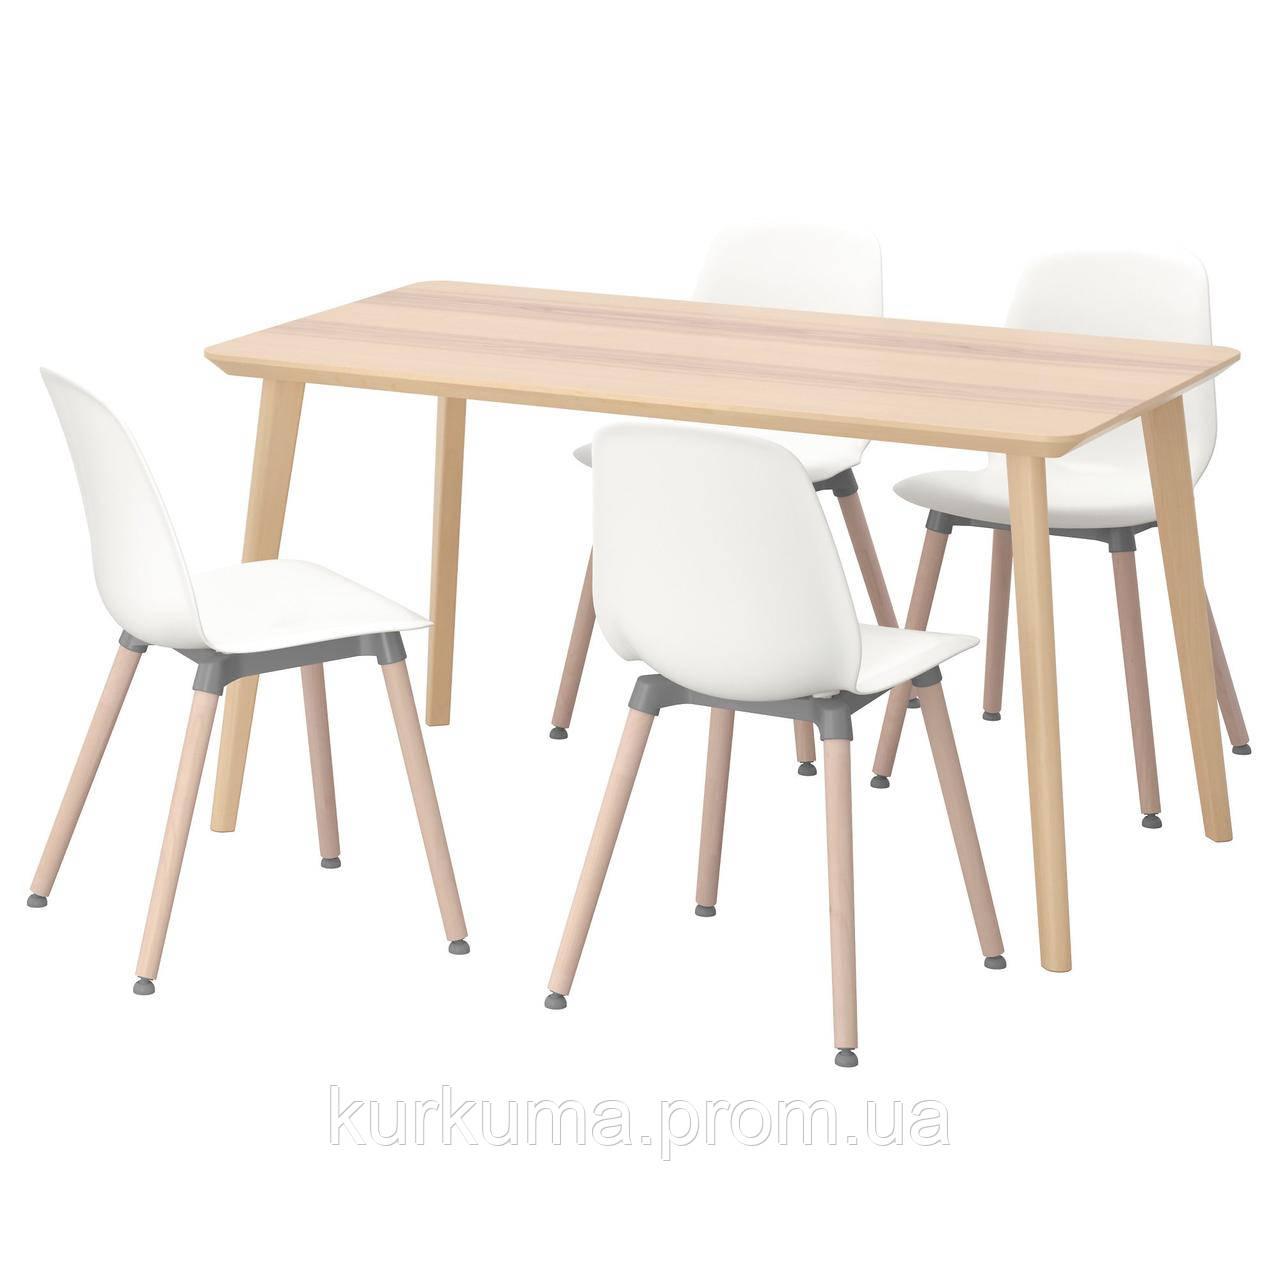 IKEA LISABO/LEIFARNE Стол и 4 стула, ясень шпон, белый  (291.614.84)